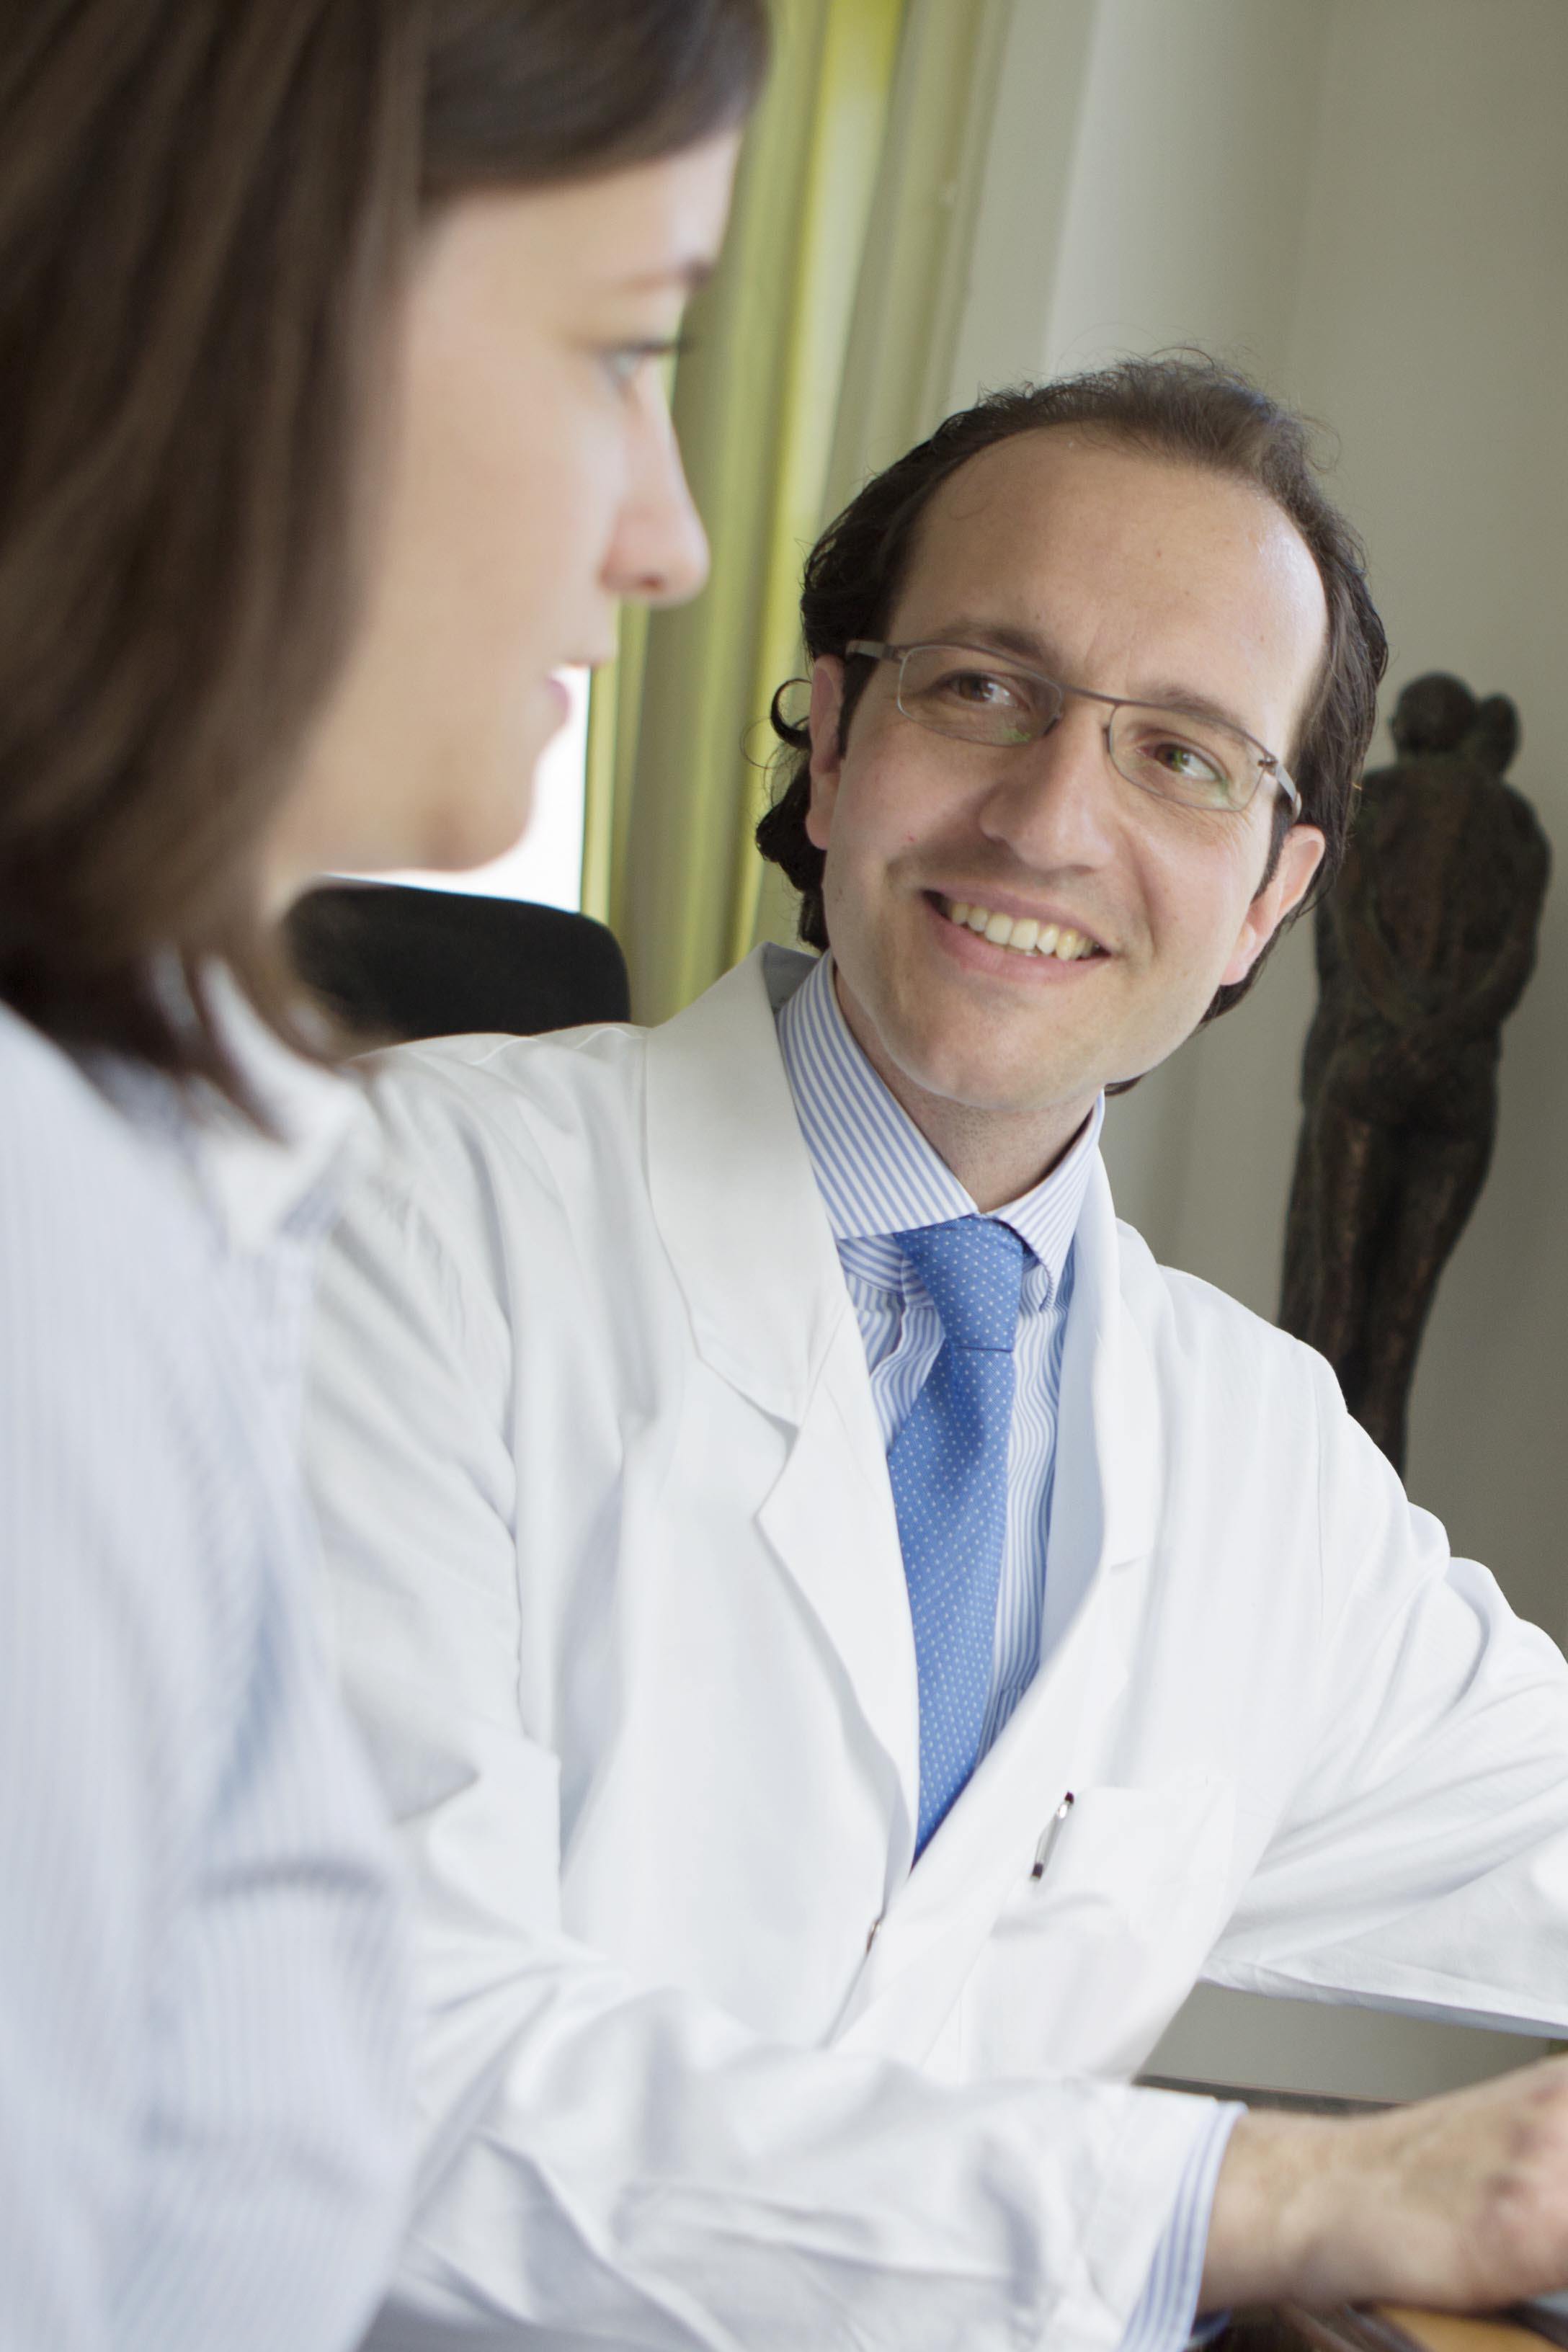 prof. friedrich mrt 5